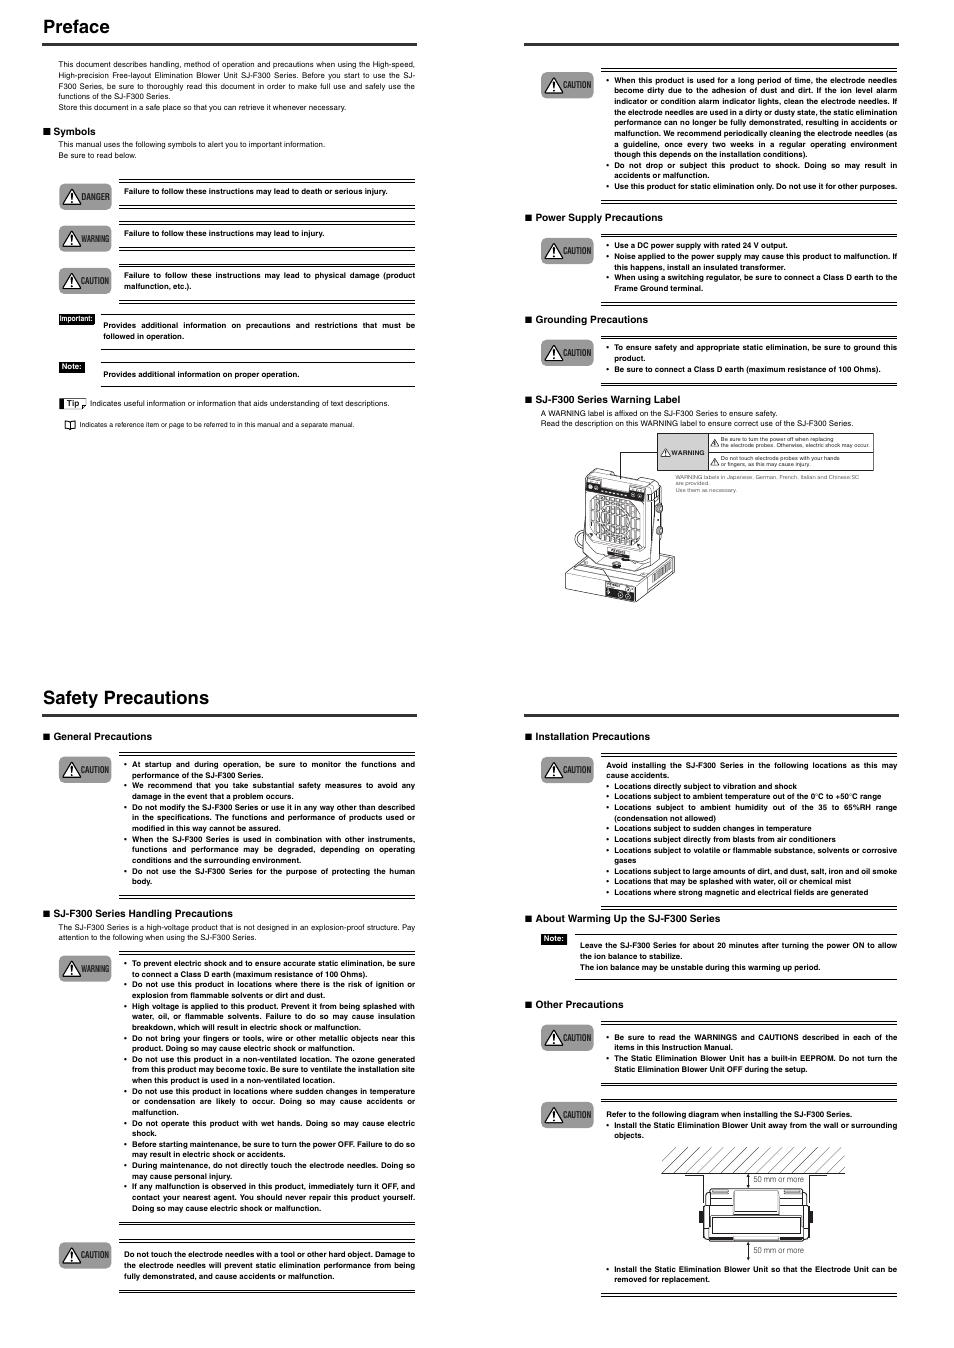 Preface, Safety precautions, Start /stop balance ion fan